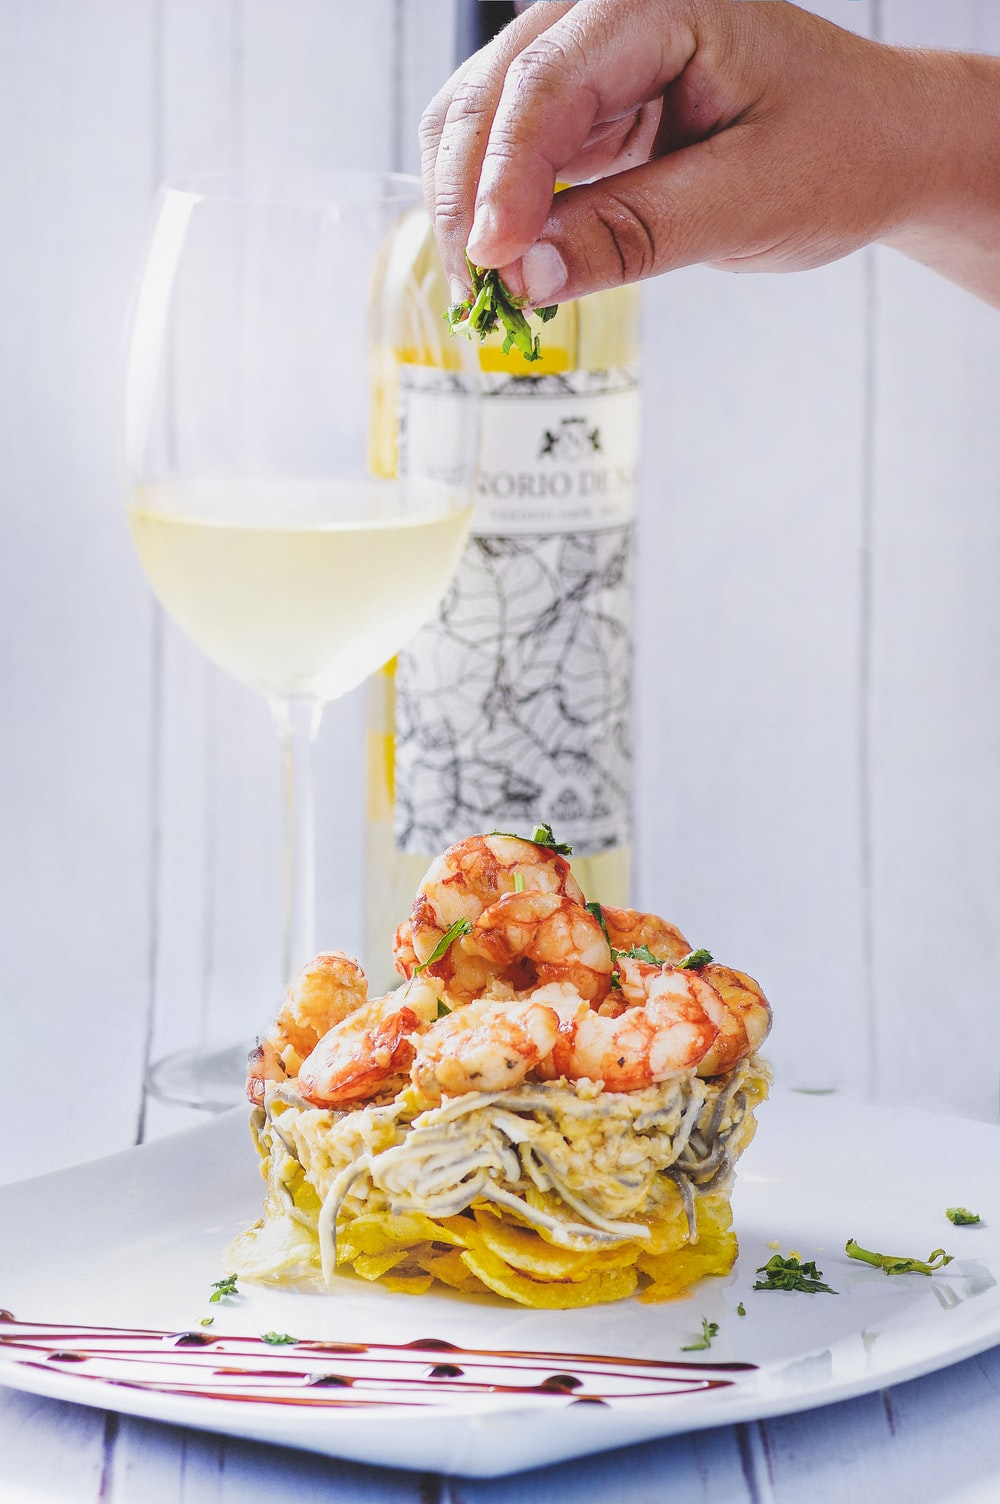 shrimp pasta and half-filled wine glass